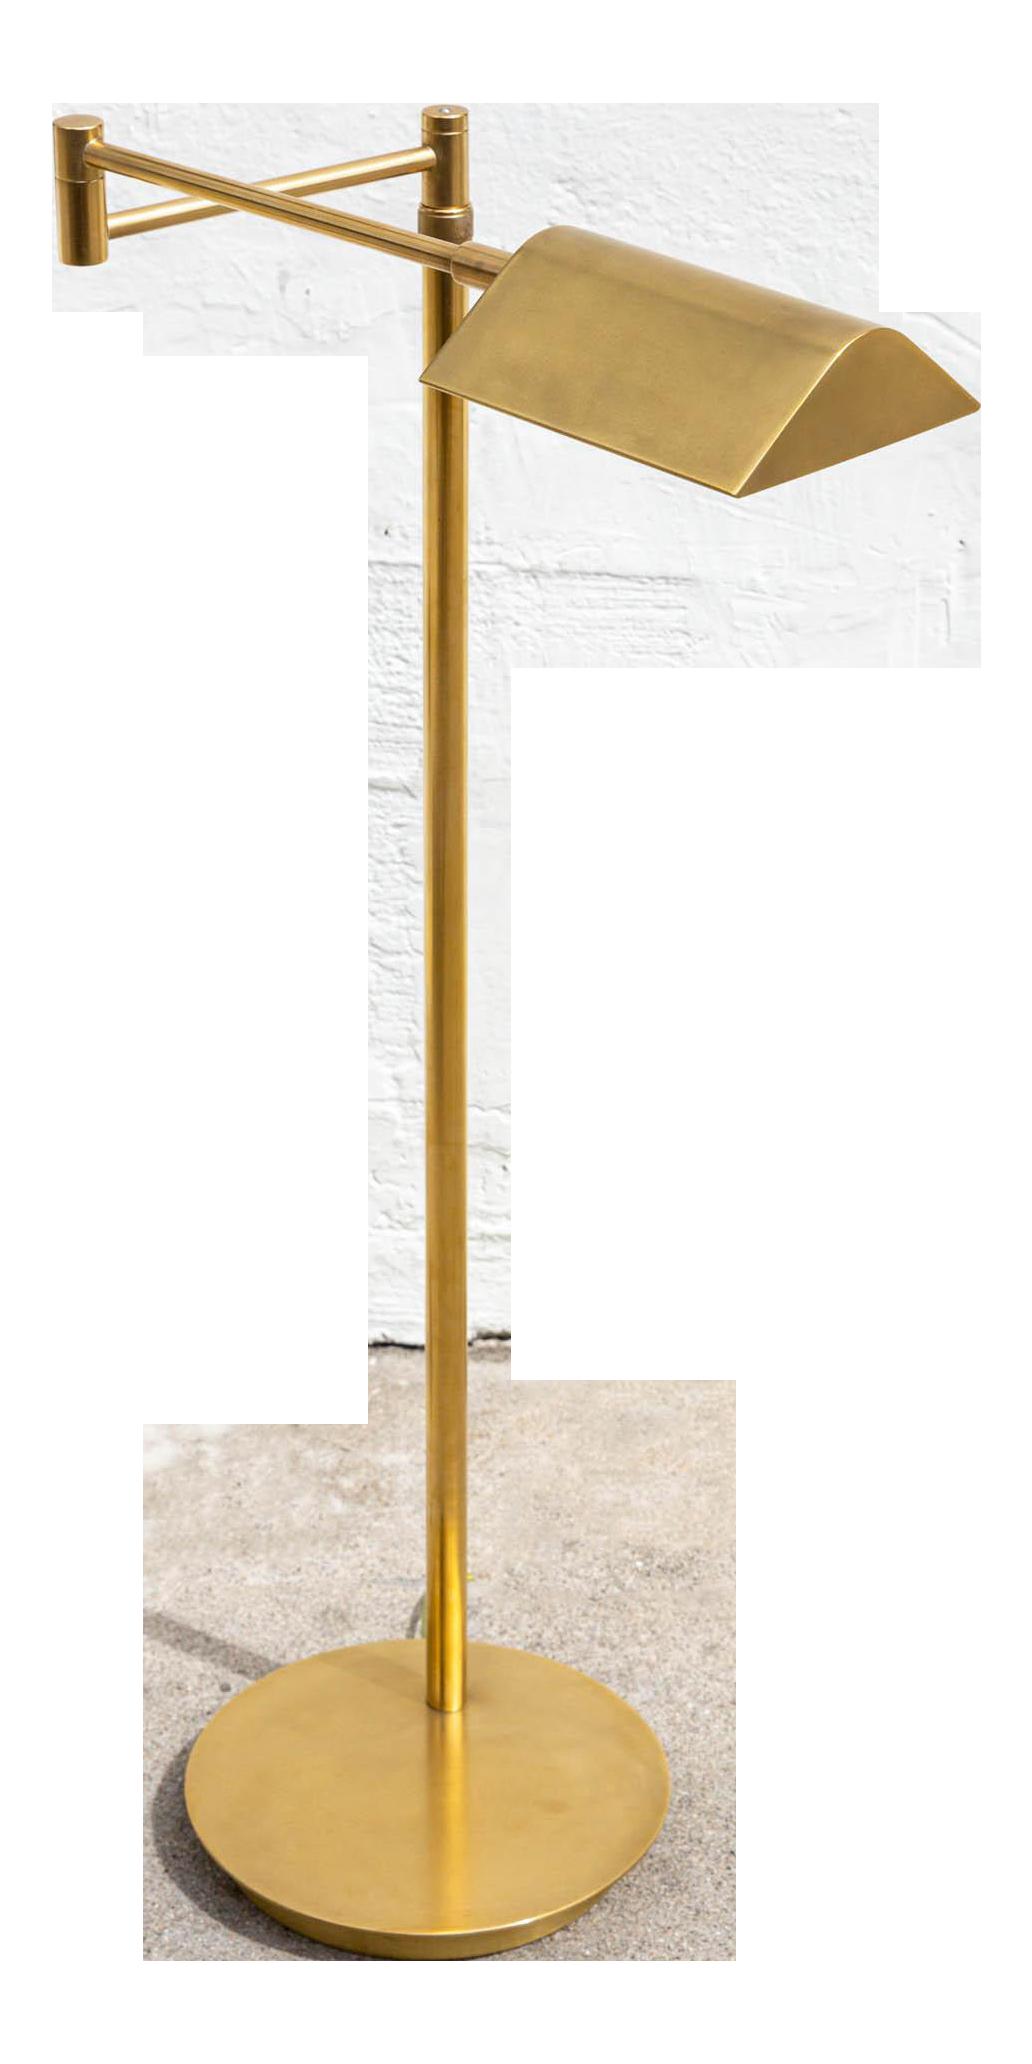 Image of: Vintage Brushed Brass Pharmacy Floor Lamp Chairish